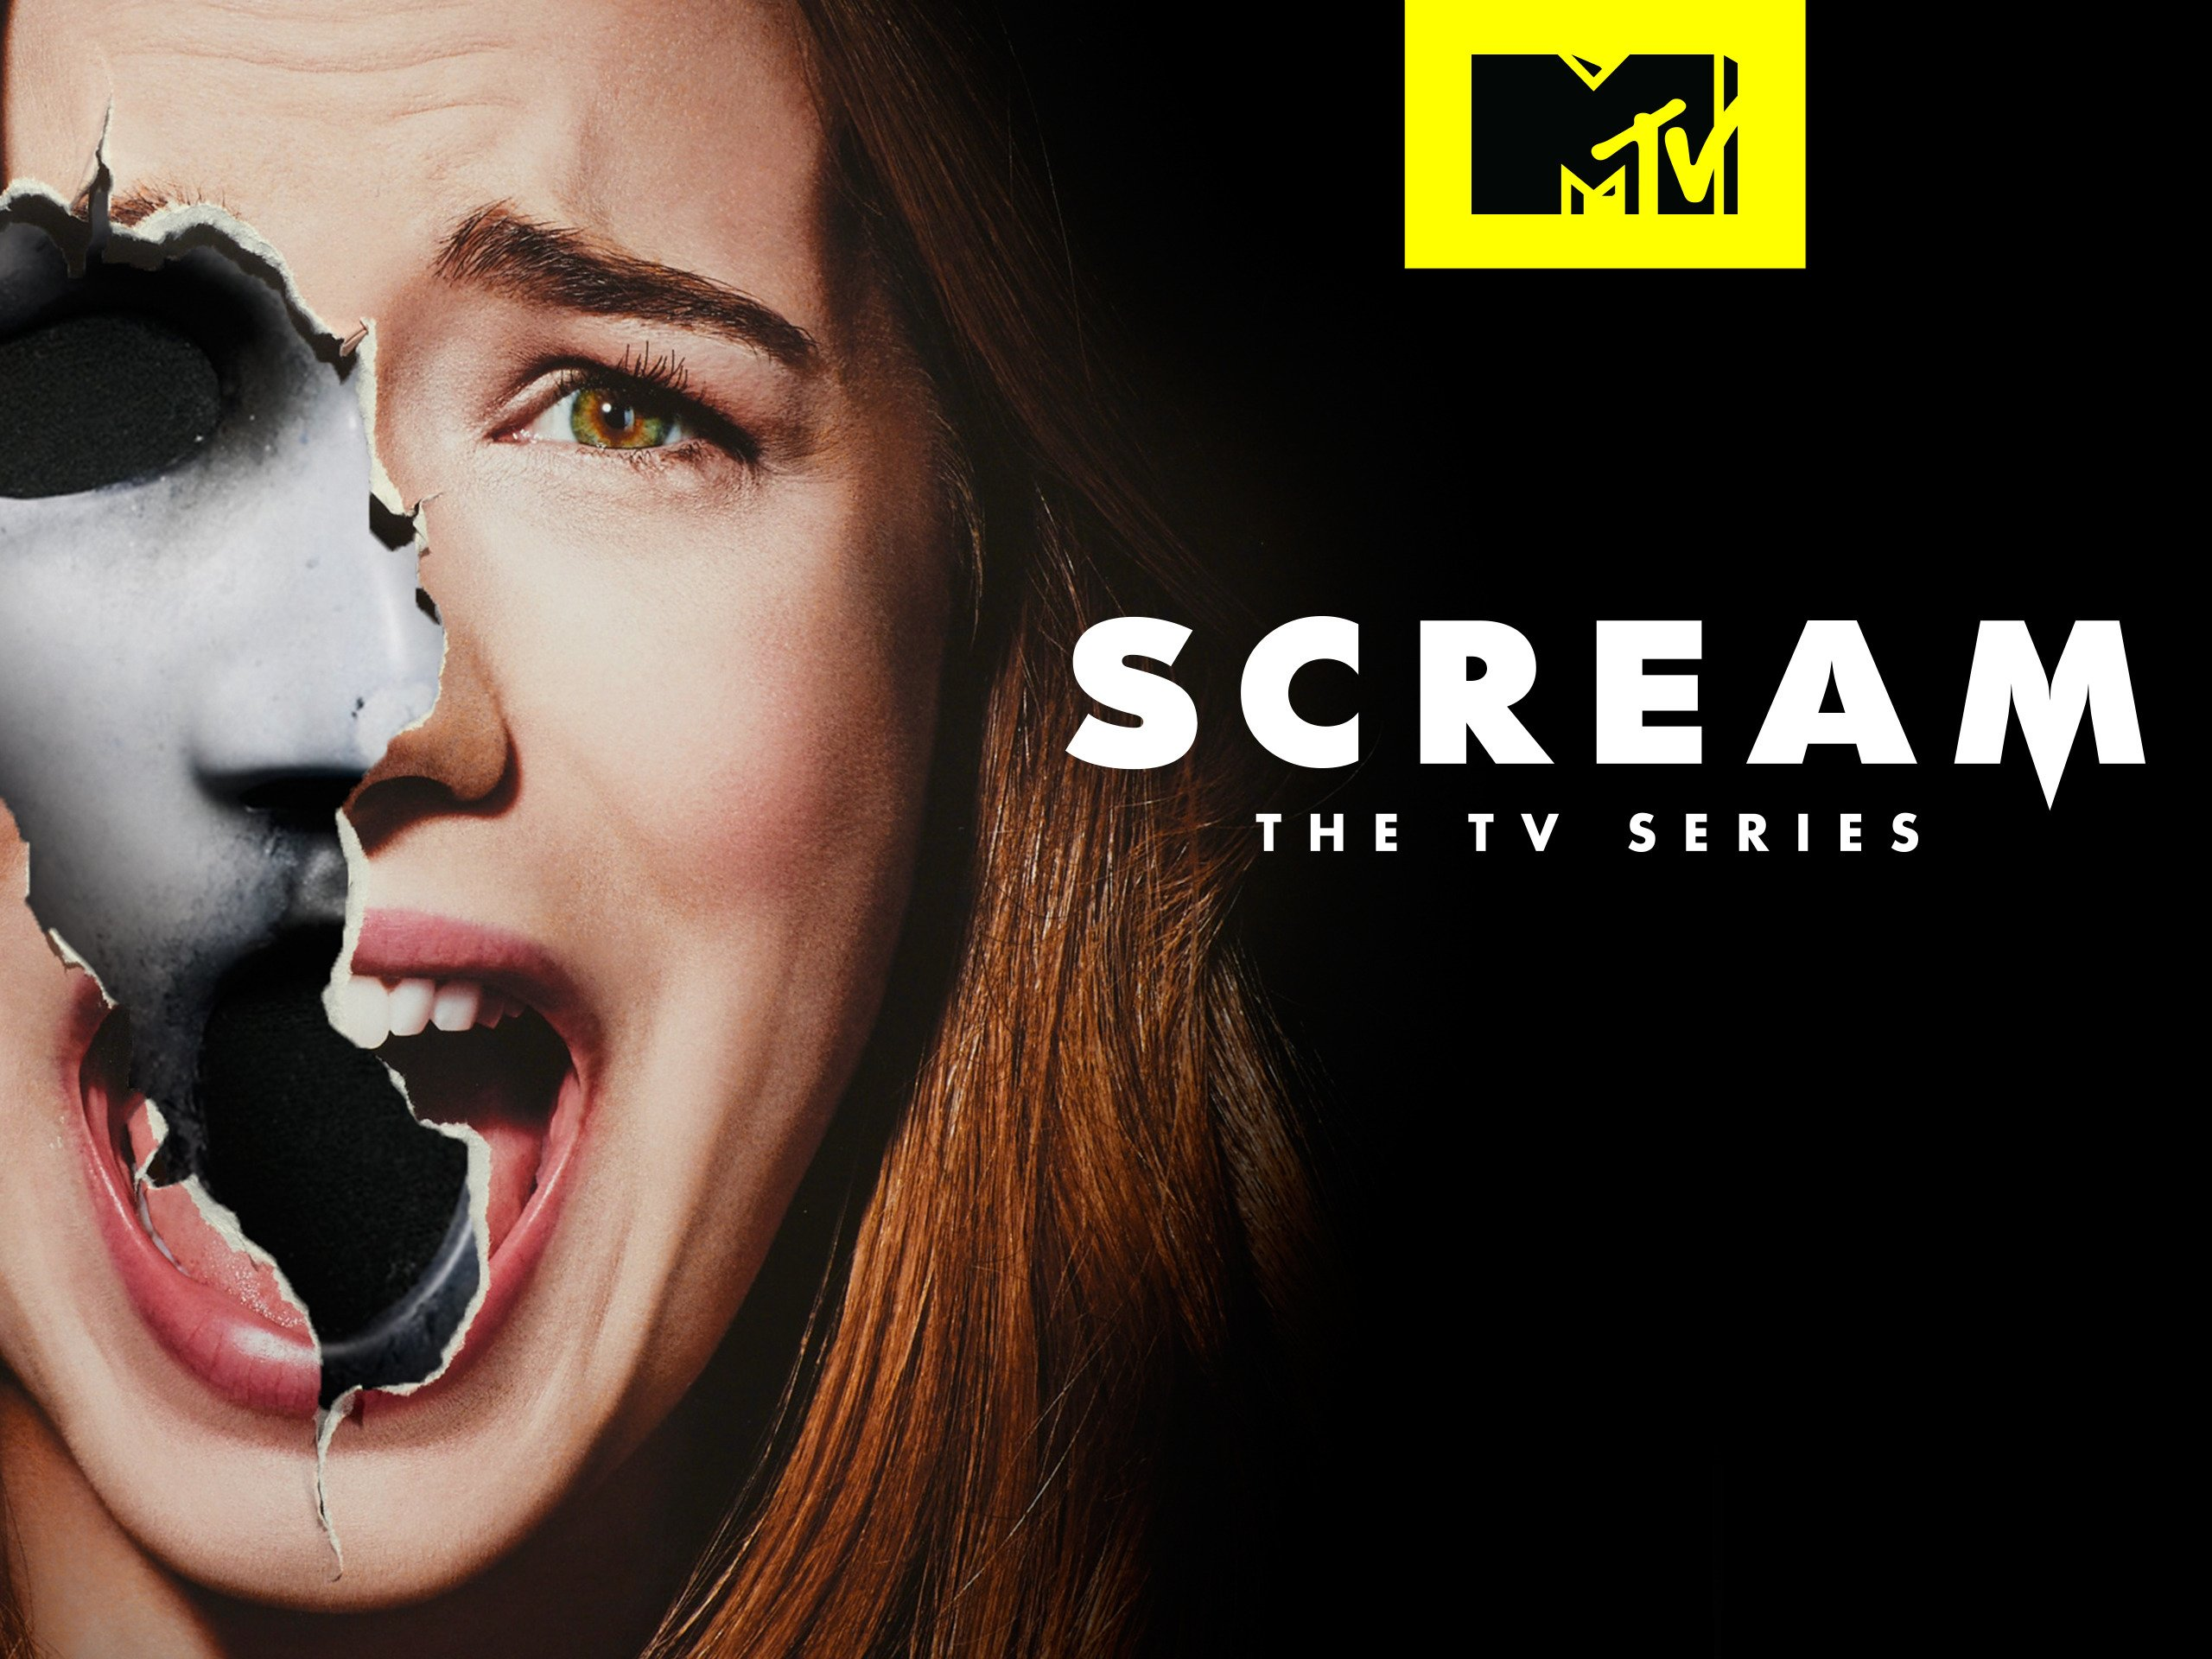 Amazon.com: Watch Scream: The TV Series | Prime Video